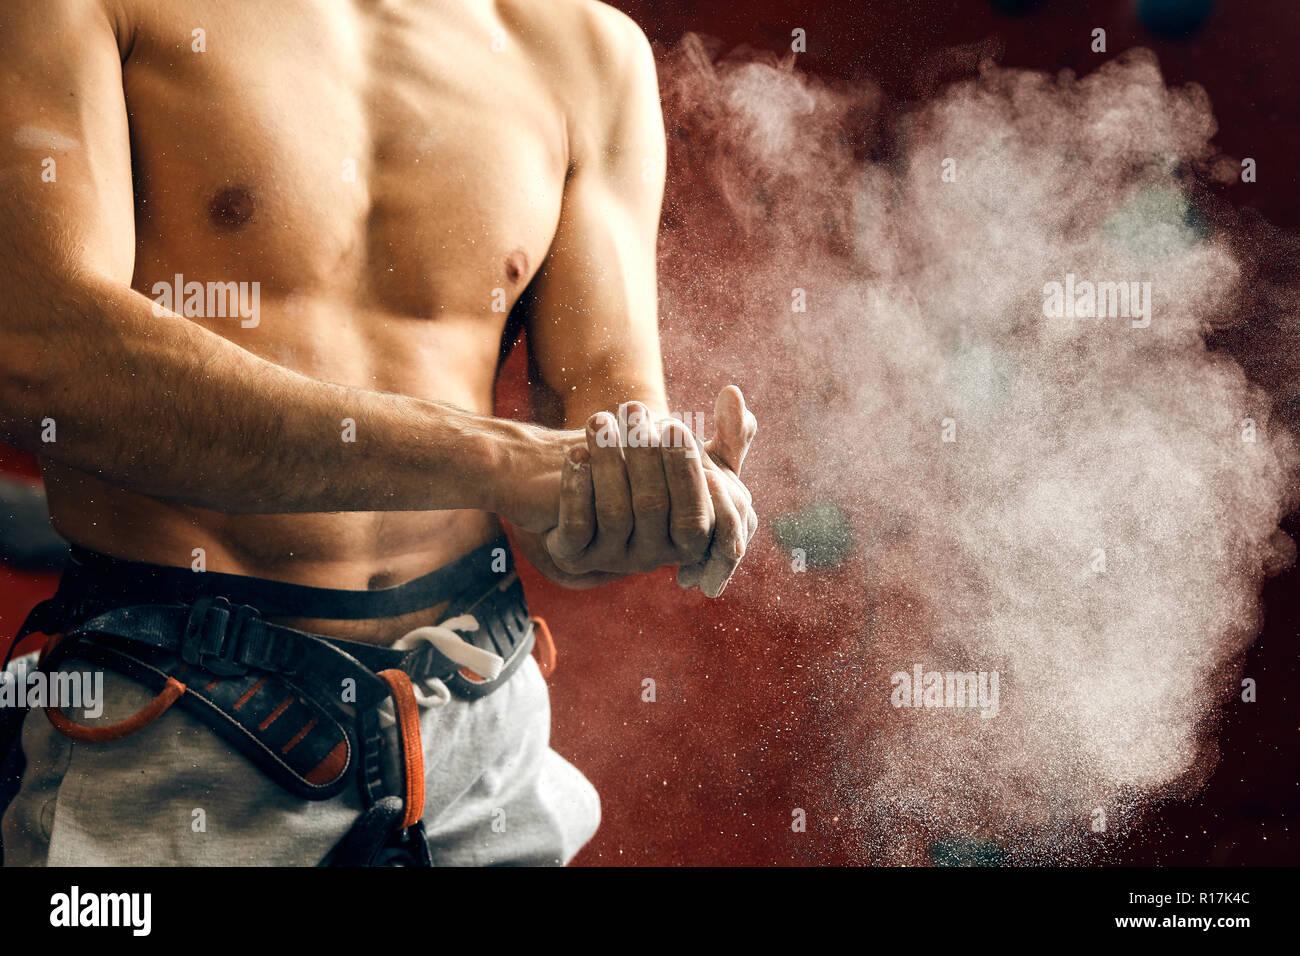 Man coating his hands in powder chalk magnesium preparing to climb, motion Stock Photo